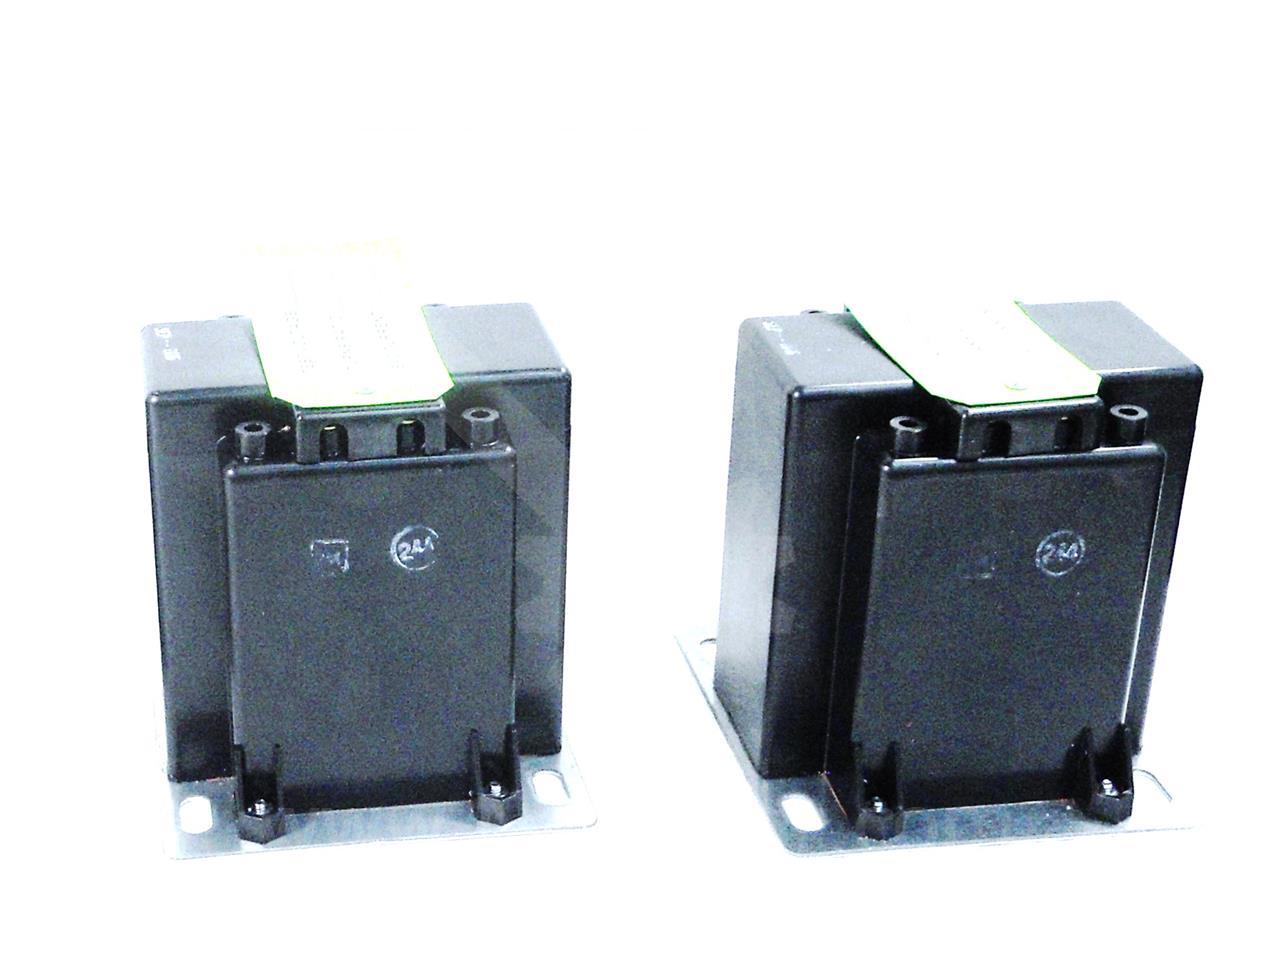 Instrument Transformer ITI 4:1 POTENTIAL TRANSFORMER